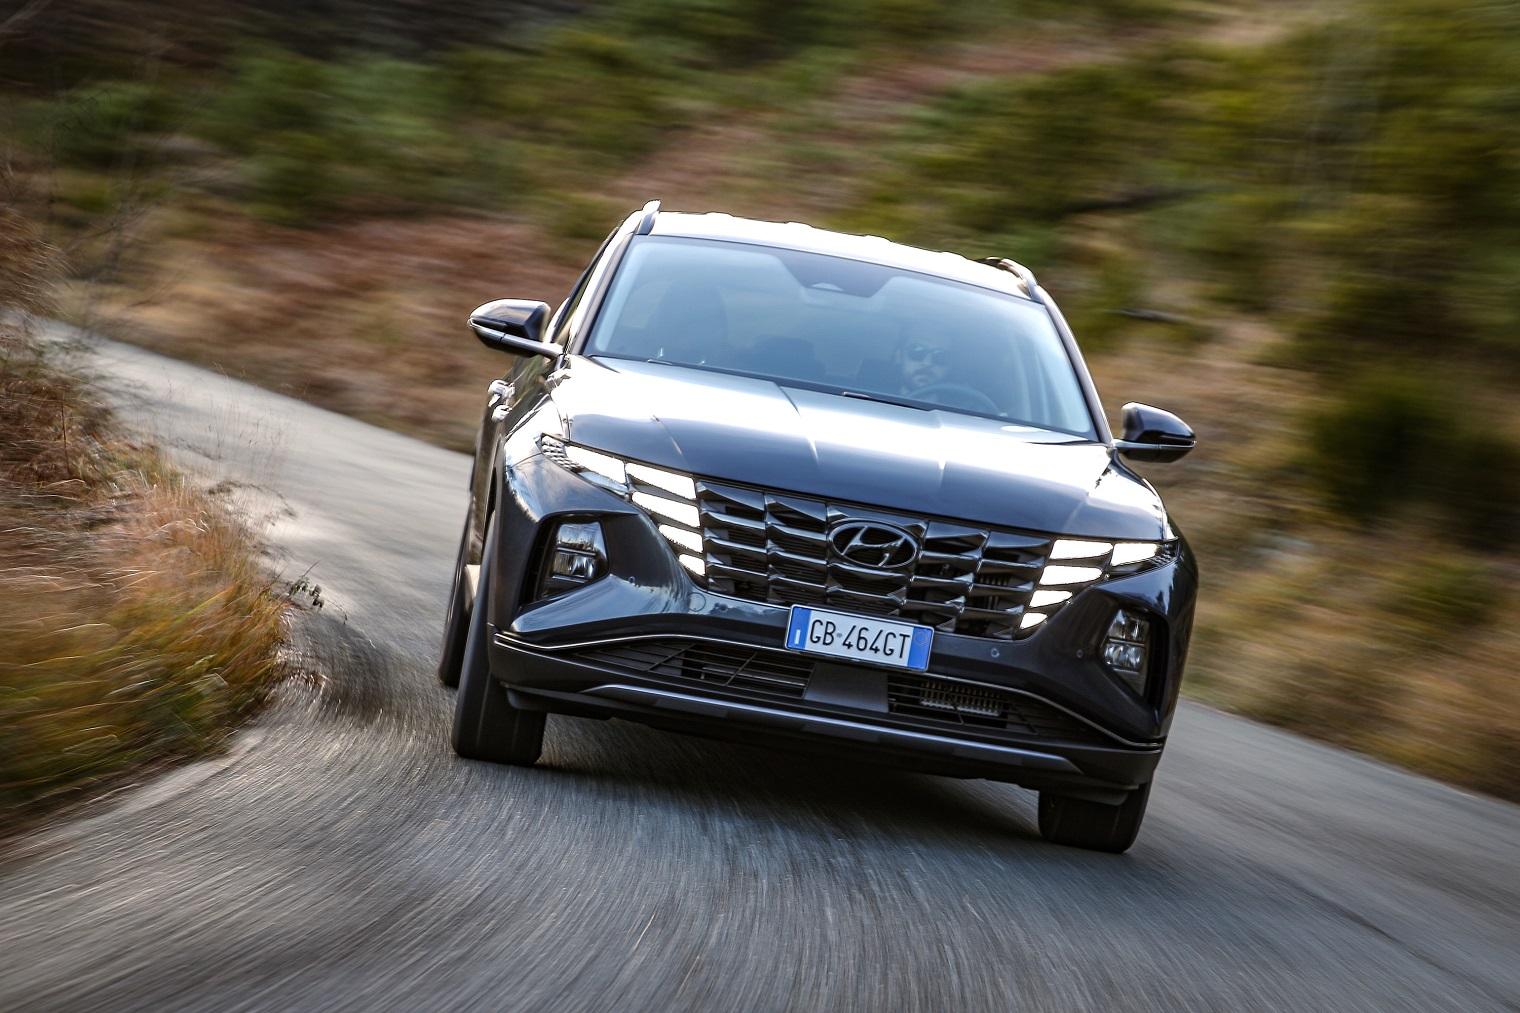 Nuova Hyundai Tucson 2021 lancio italiano